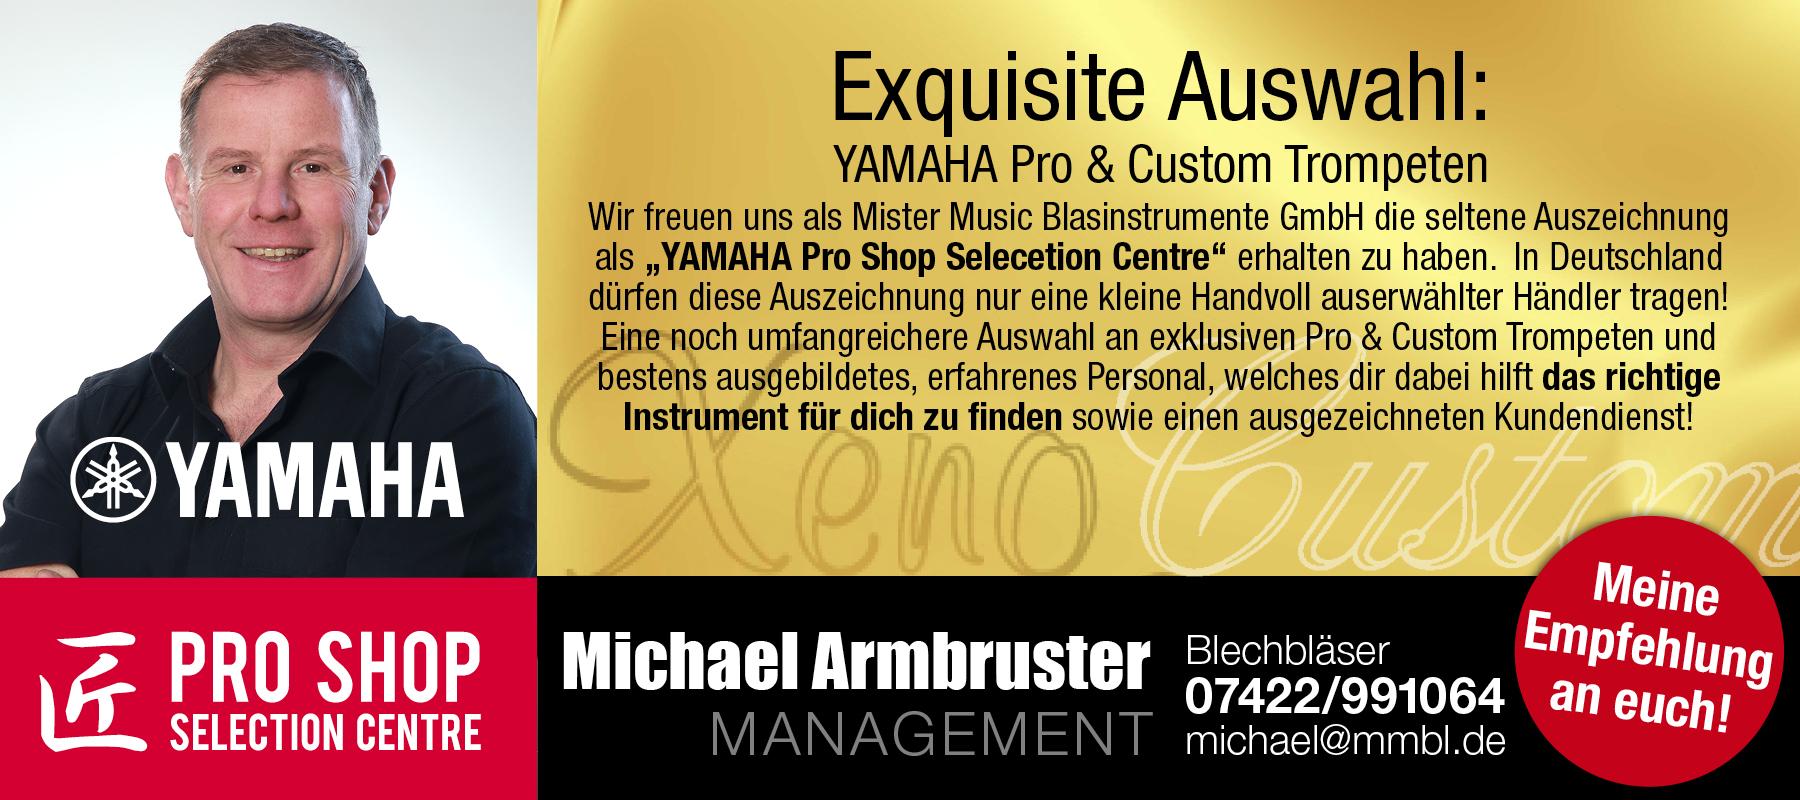 Yamaha Pro Shop Selection Centre